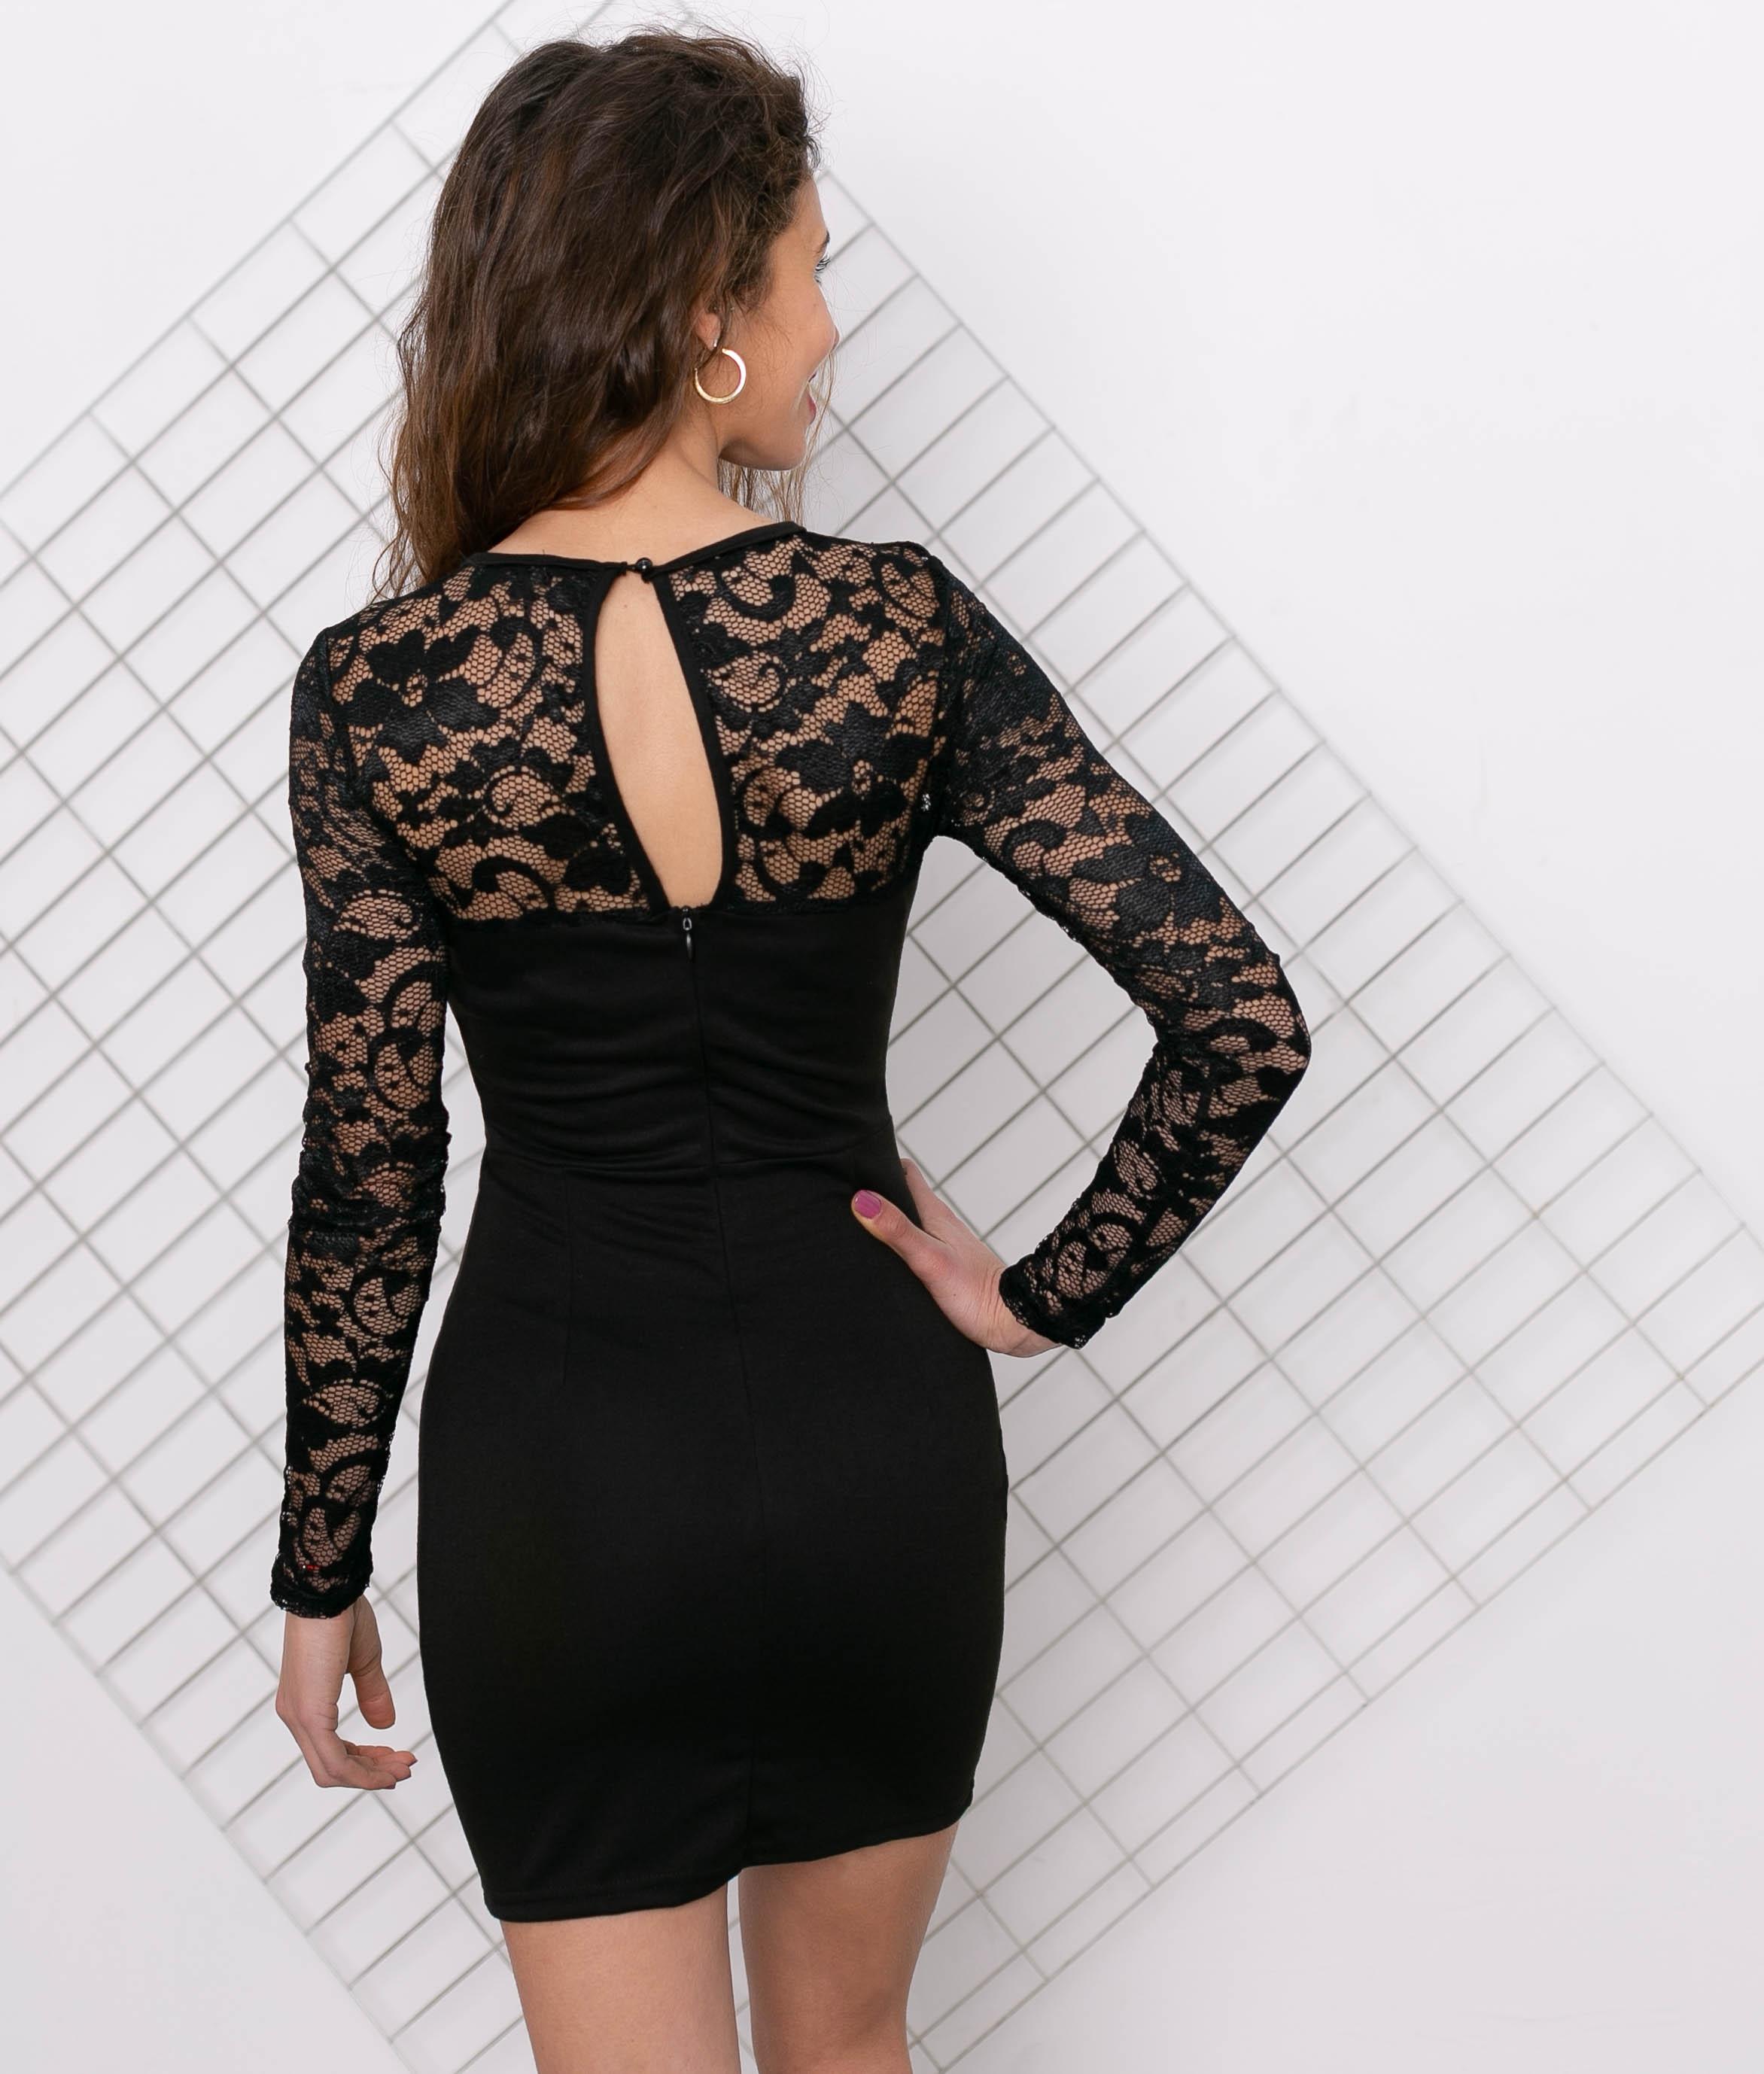 Vestido Lelu - Black